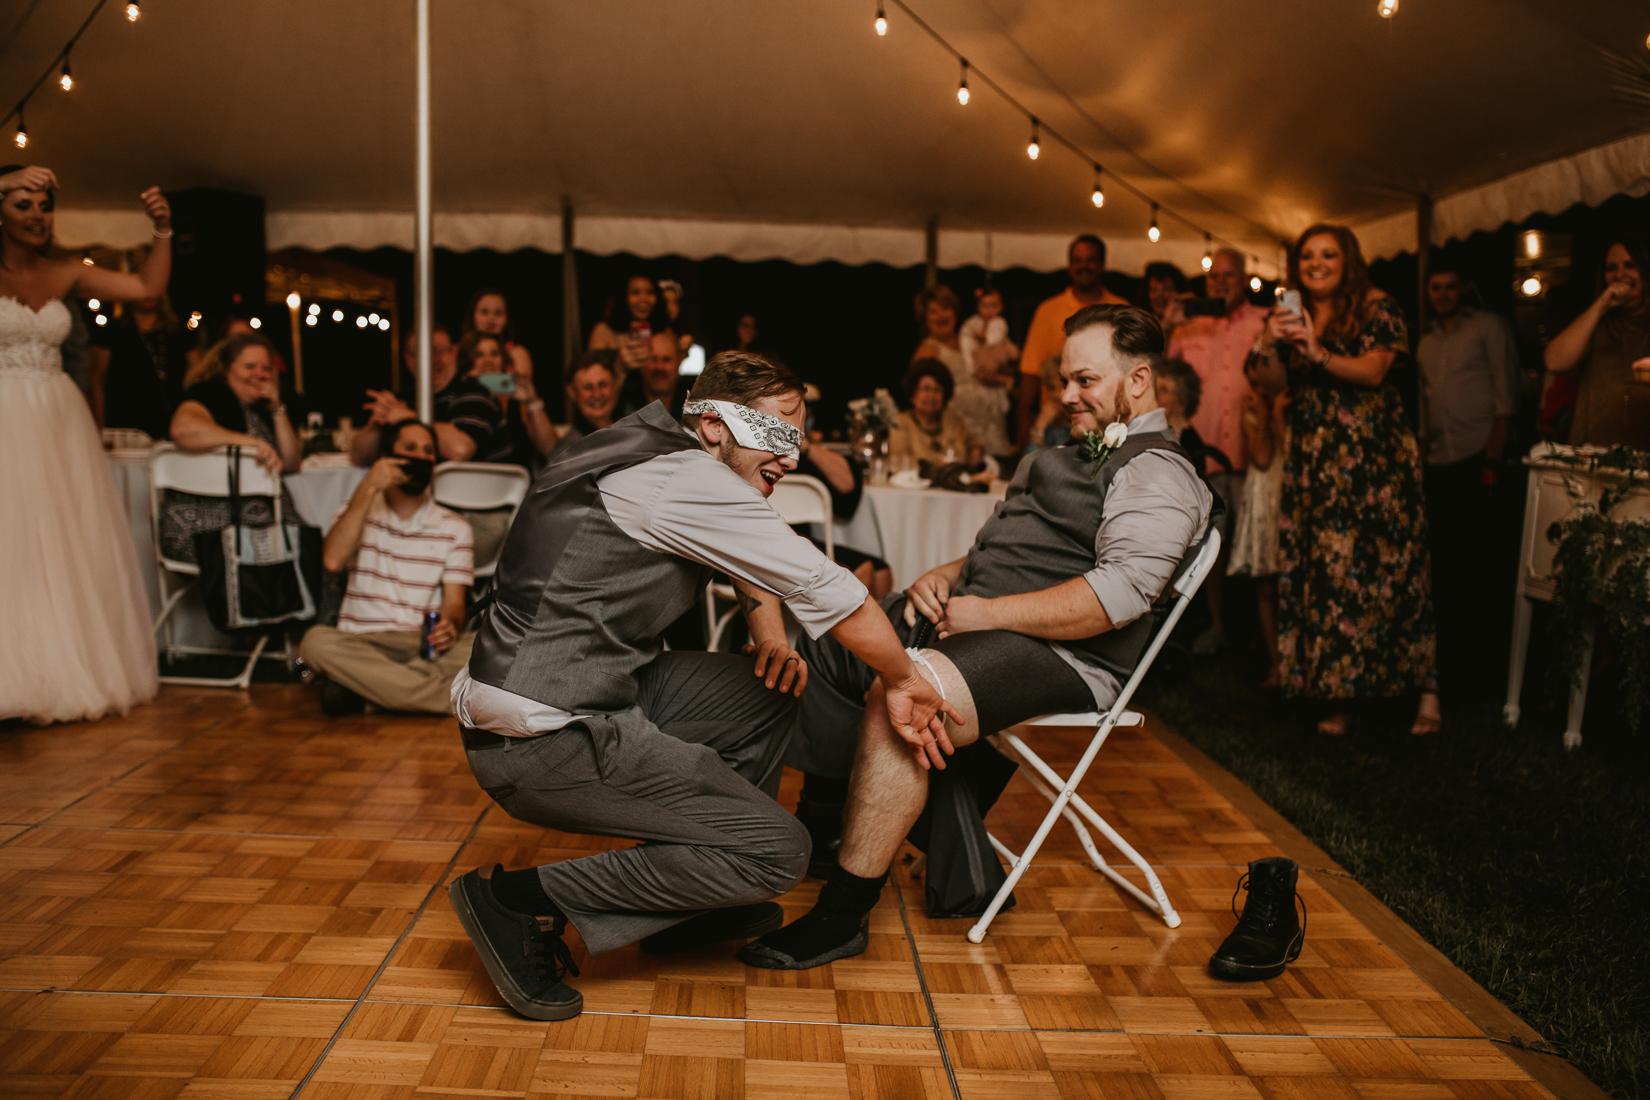 olivia_zay_wedding_09_2018-9107.jpg